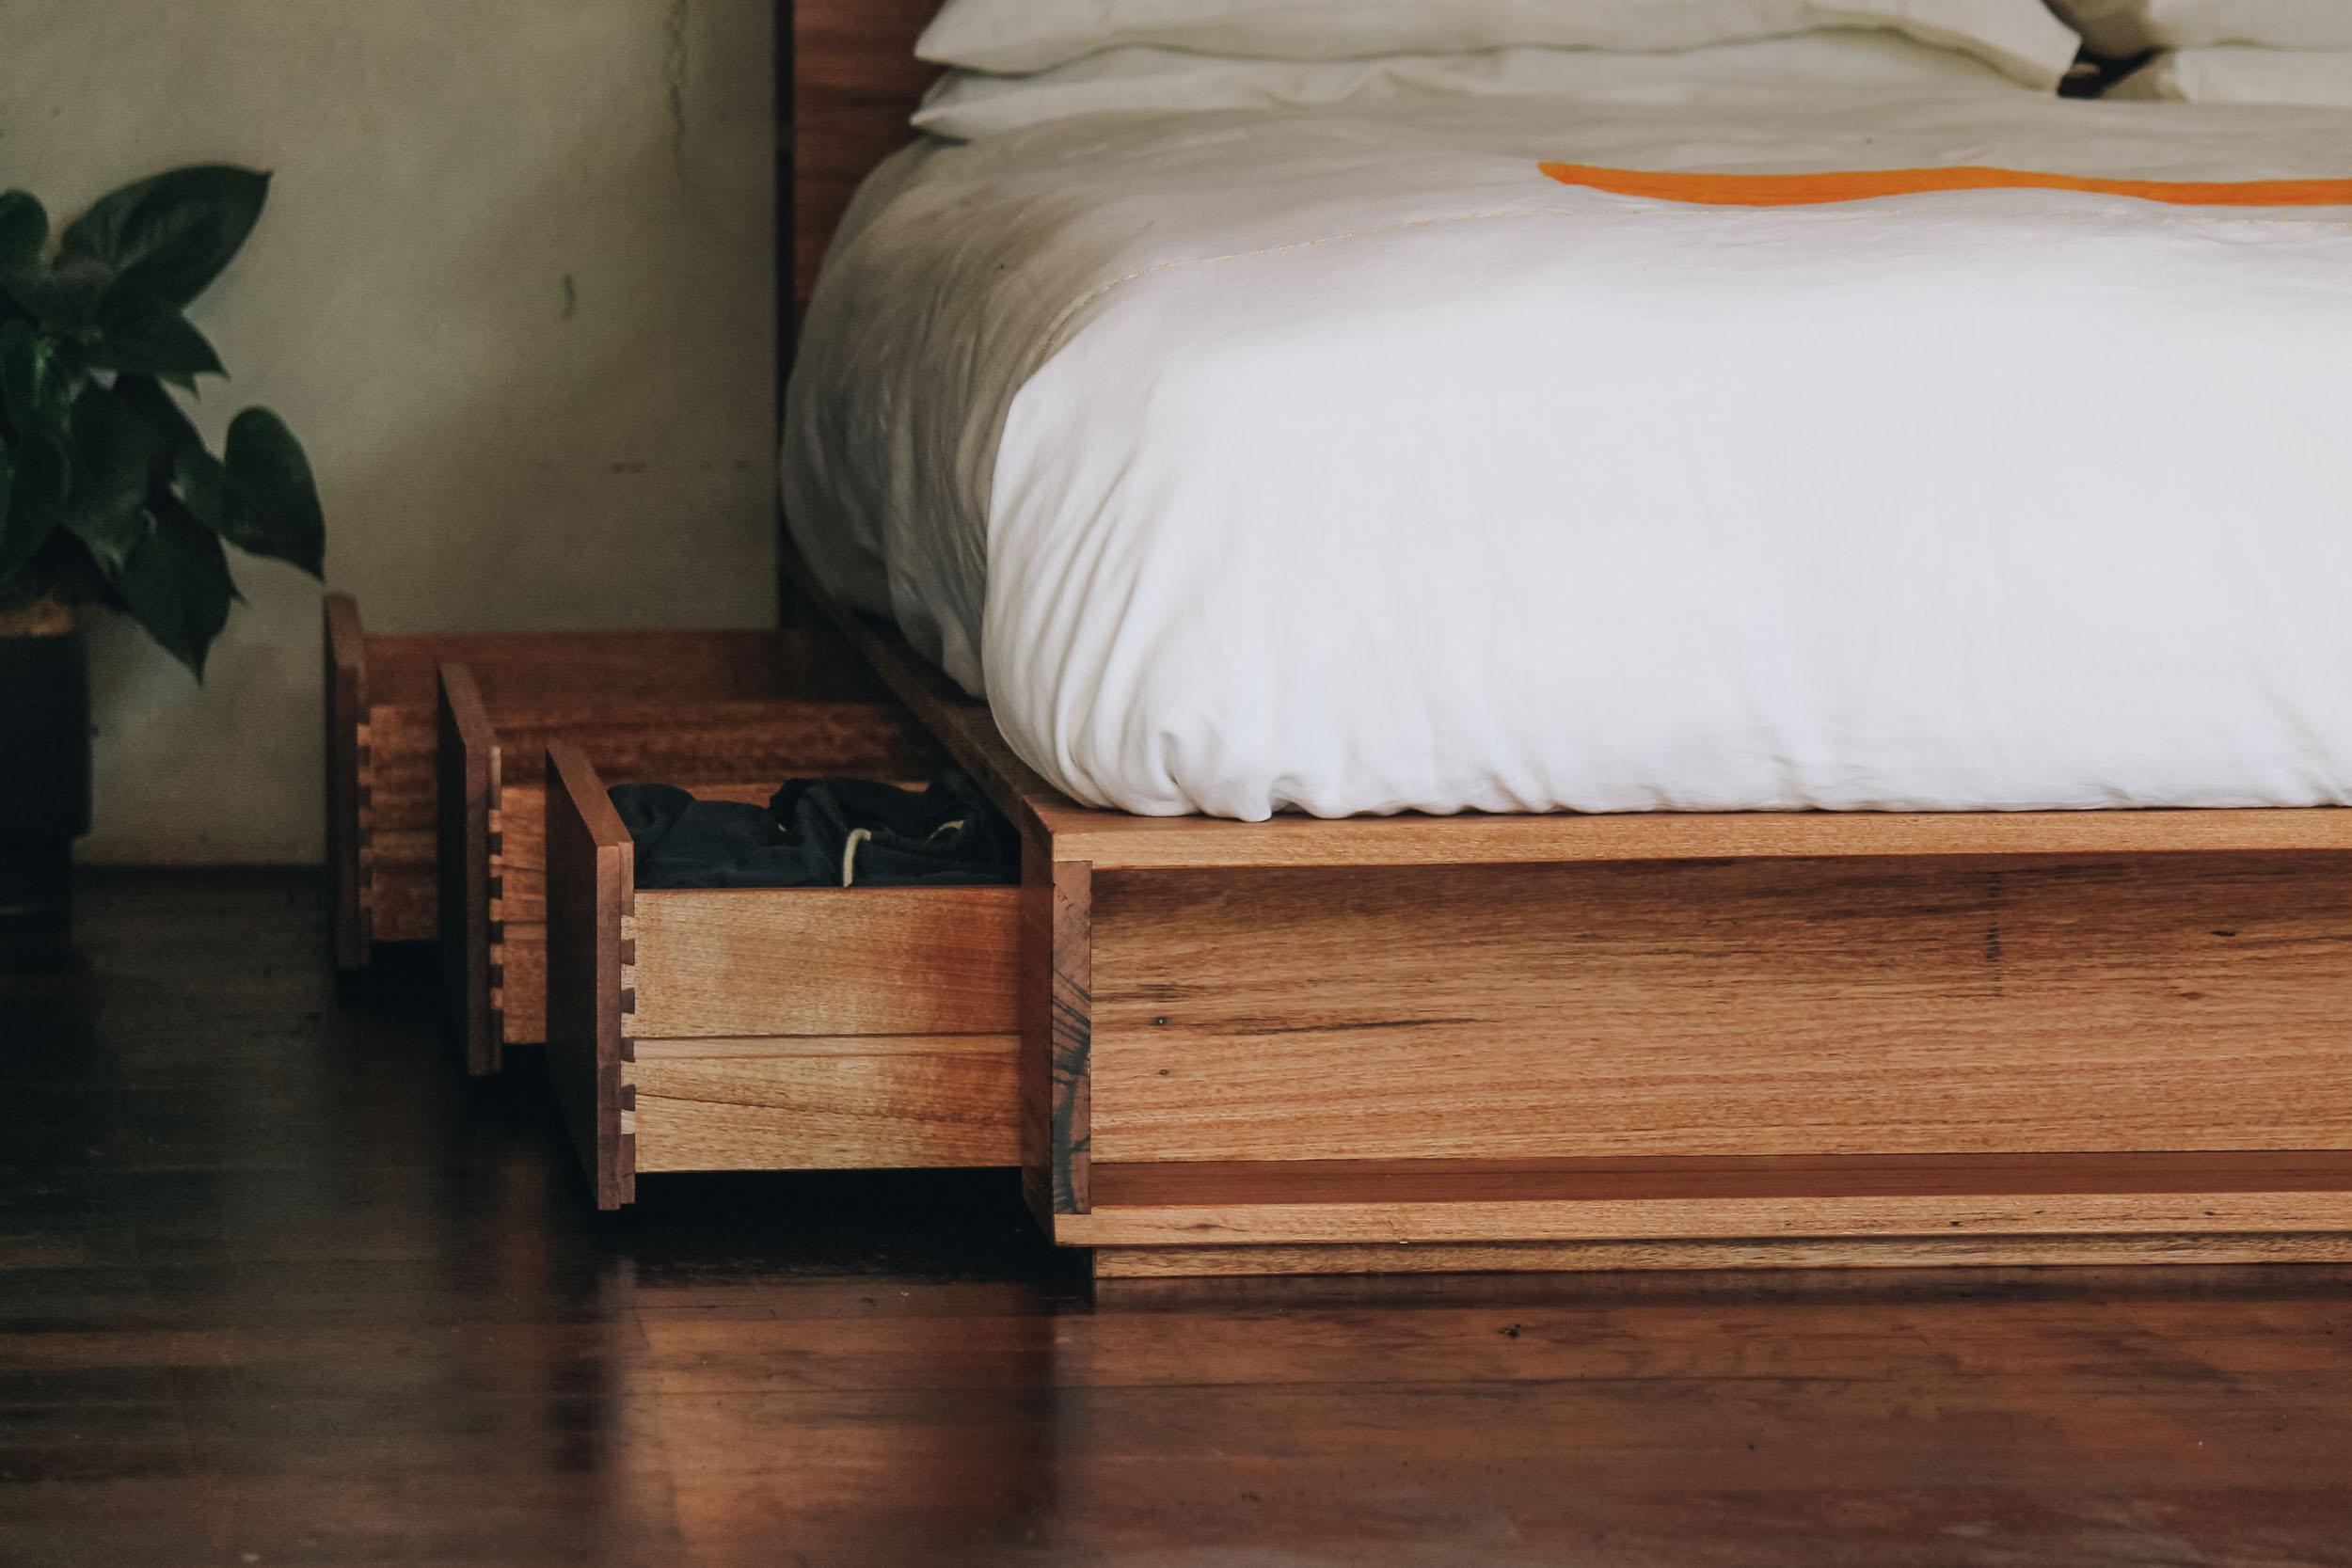 Al and Imo Handmade Bookshelf Drawer Bed Recycled timber - surf coast - melbourne - australia-3.jpg